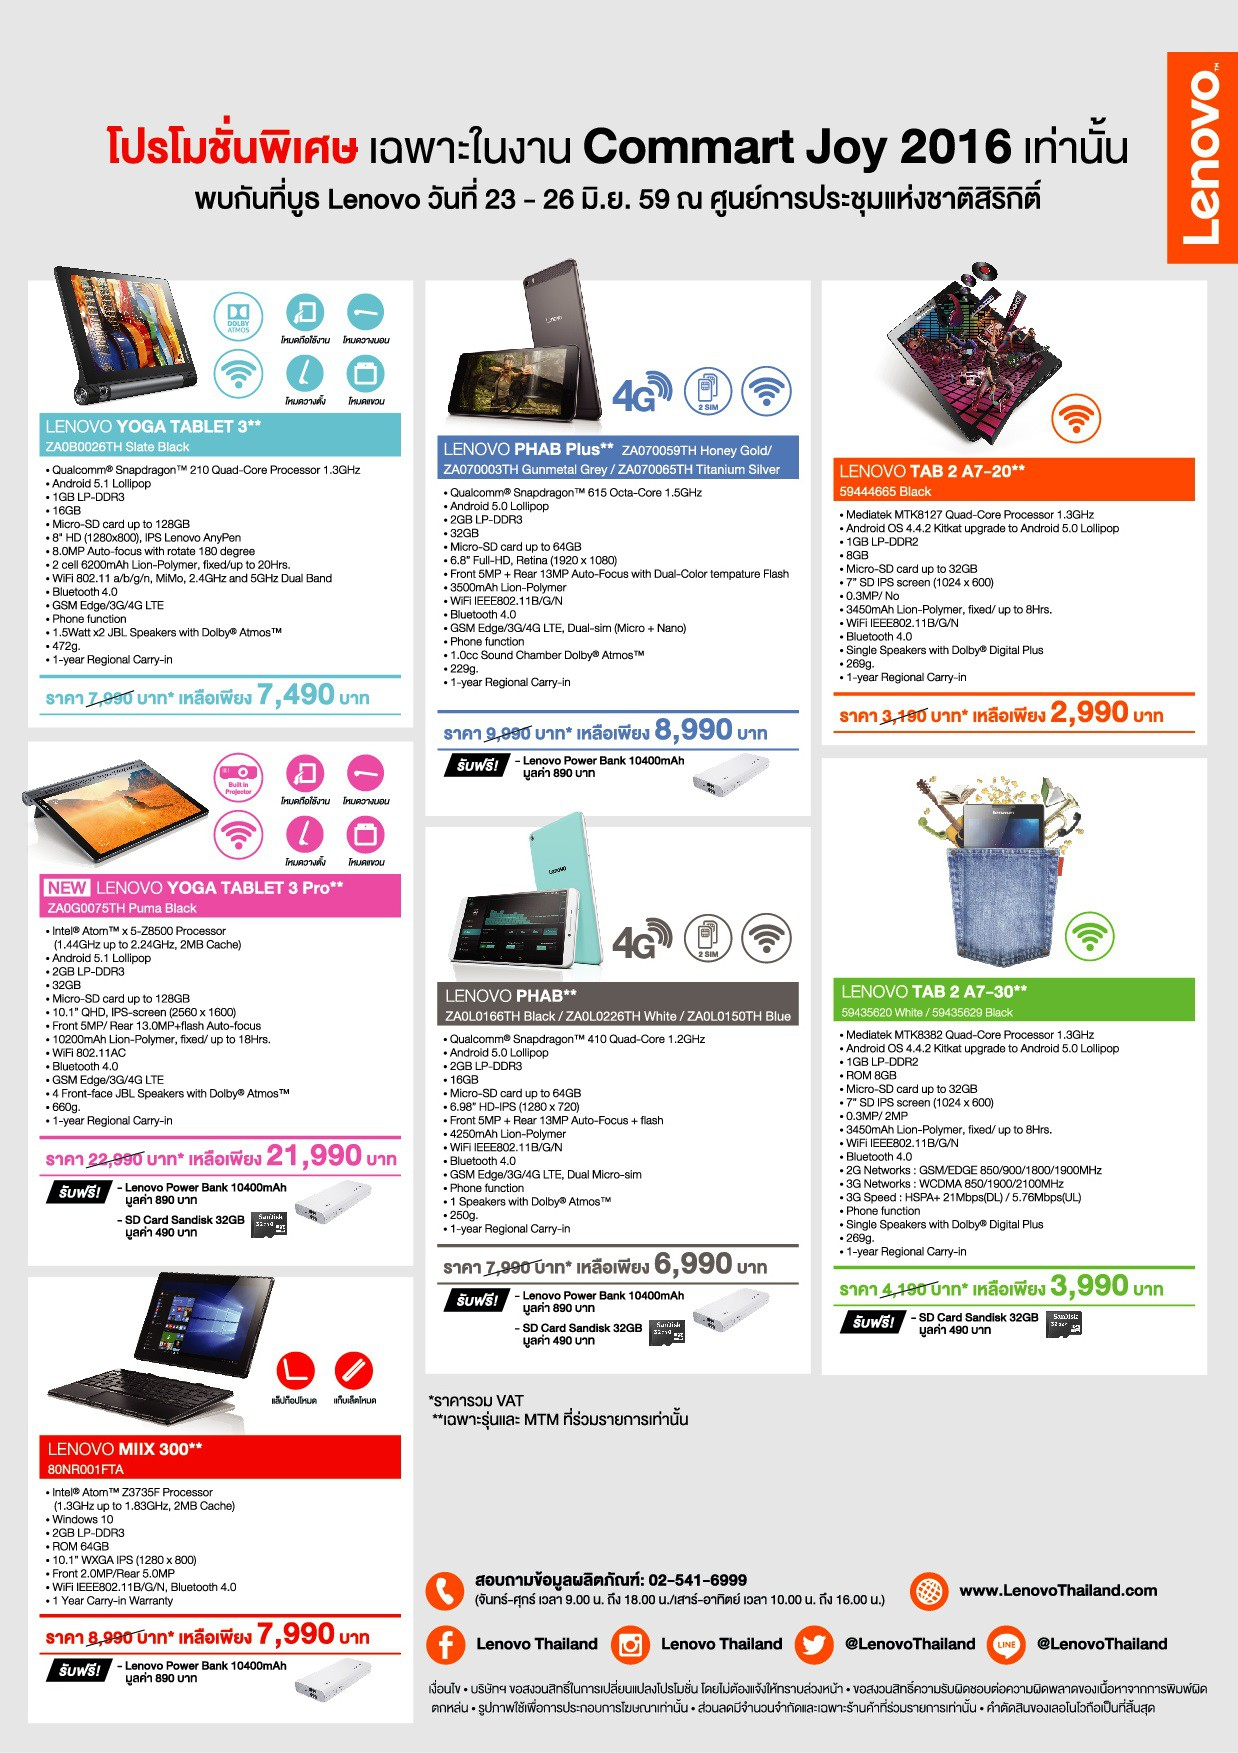 AW-Leaflet A4-Commart 2016-Lenovo Tablet-FA-02